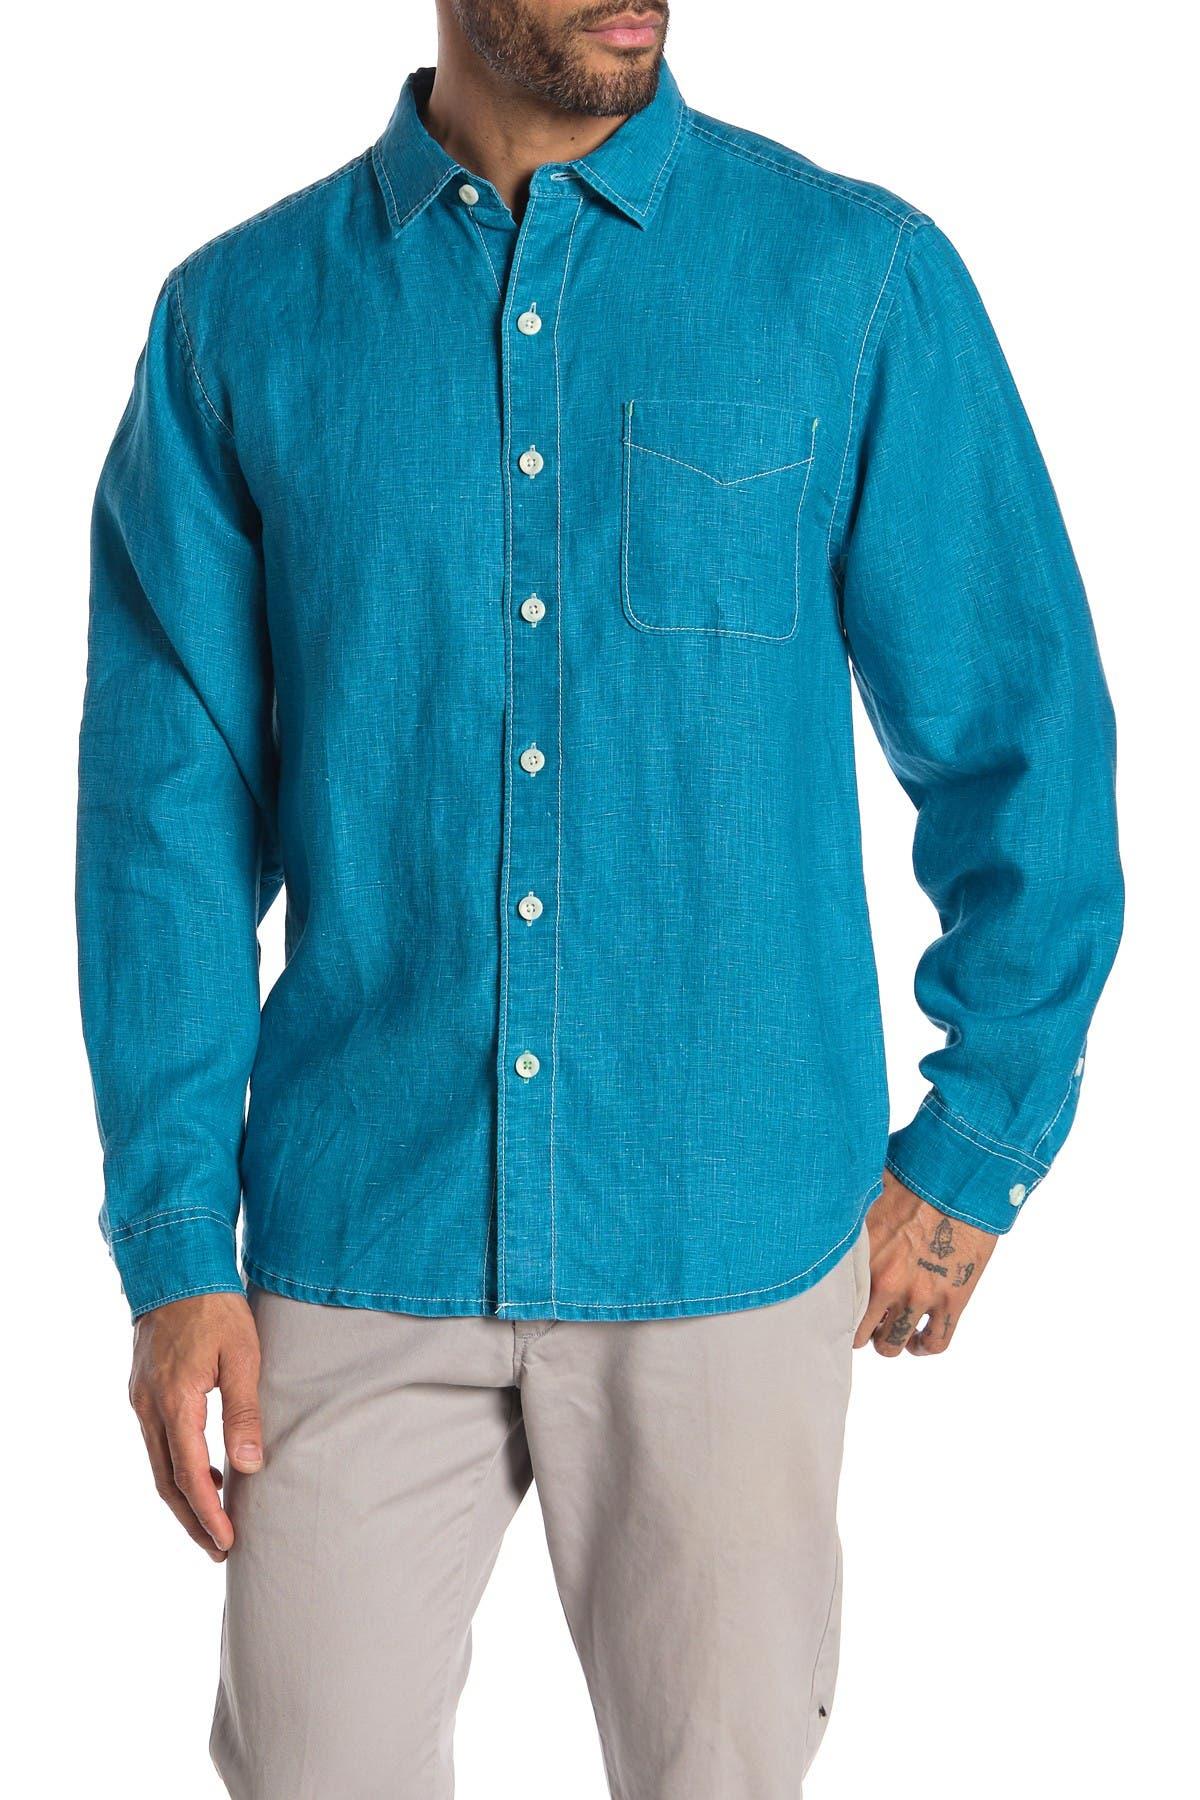 Image of Tommy Bahama Sea Glass Breezer Original Fit Linen Shirt